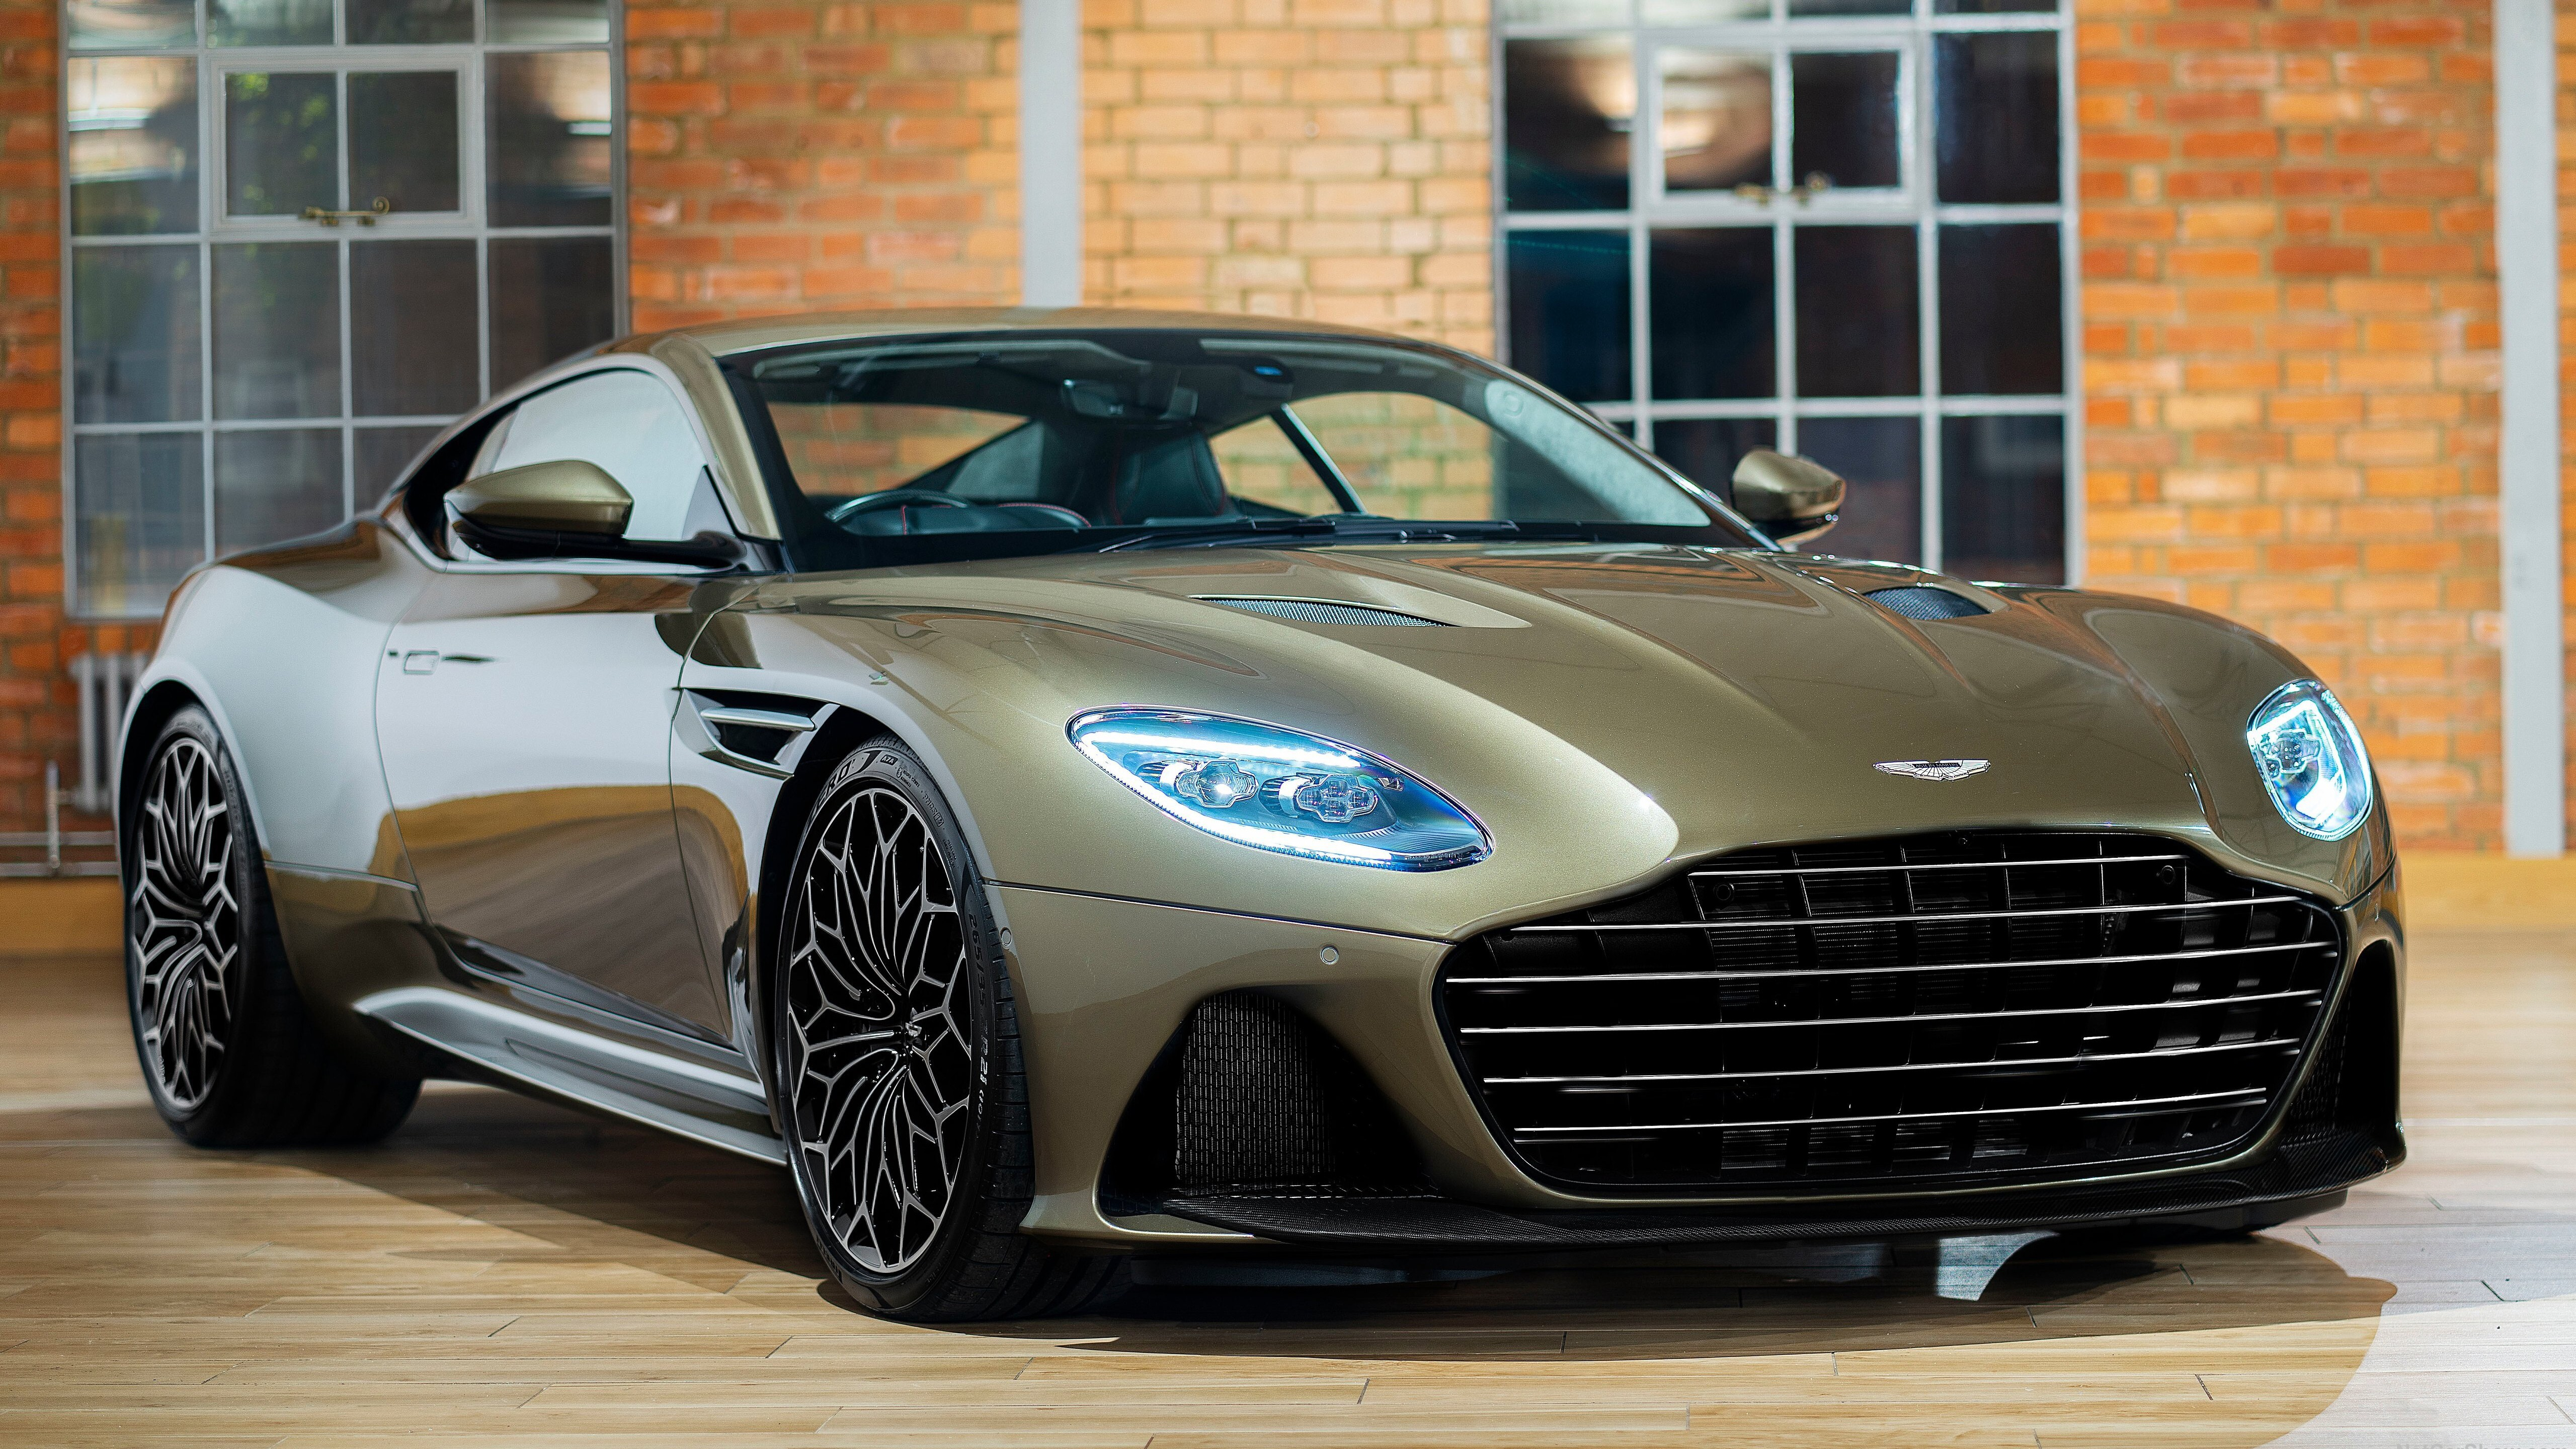 2019 Aston Martin Dbs Superleggera Car Hd Wallpapers